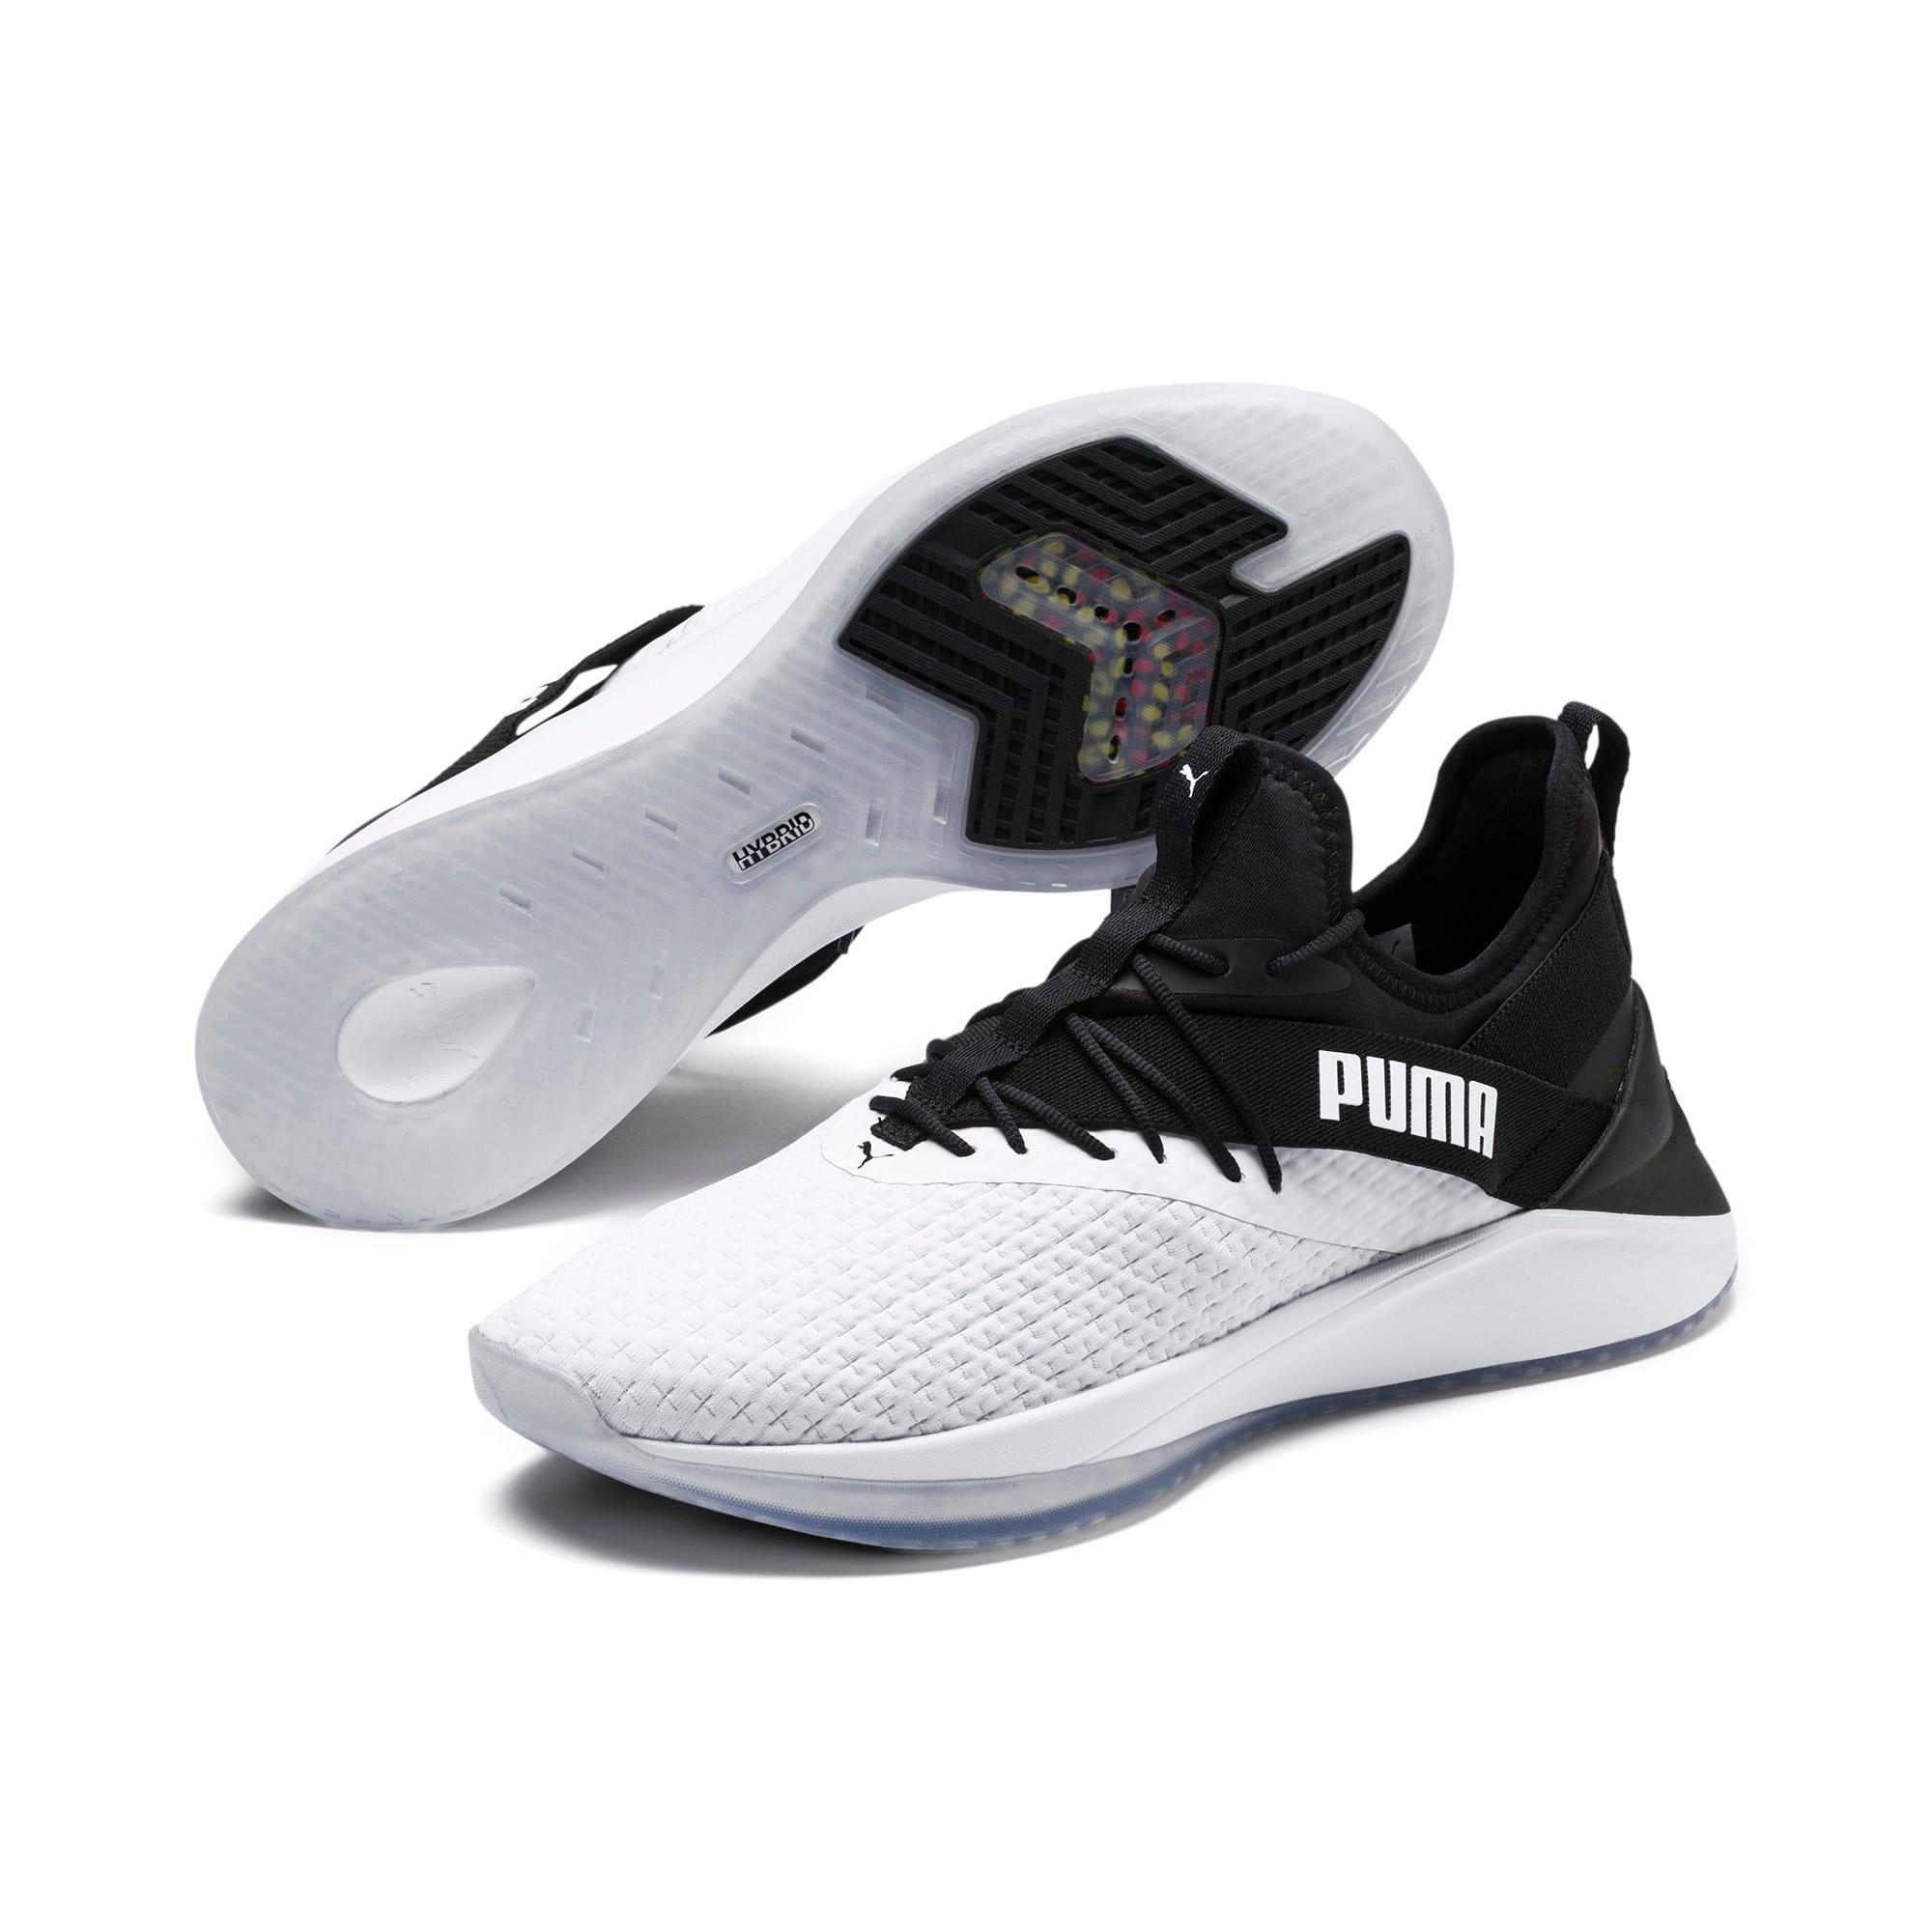 Thumbnail 3 of Basket Jaab XT pour homme, Puma White-Puma Black, medium